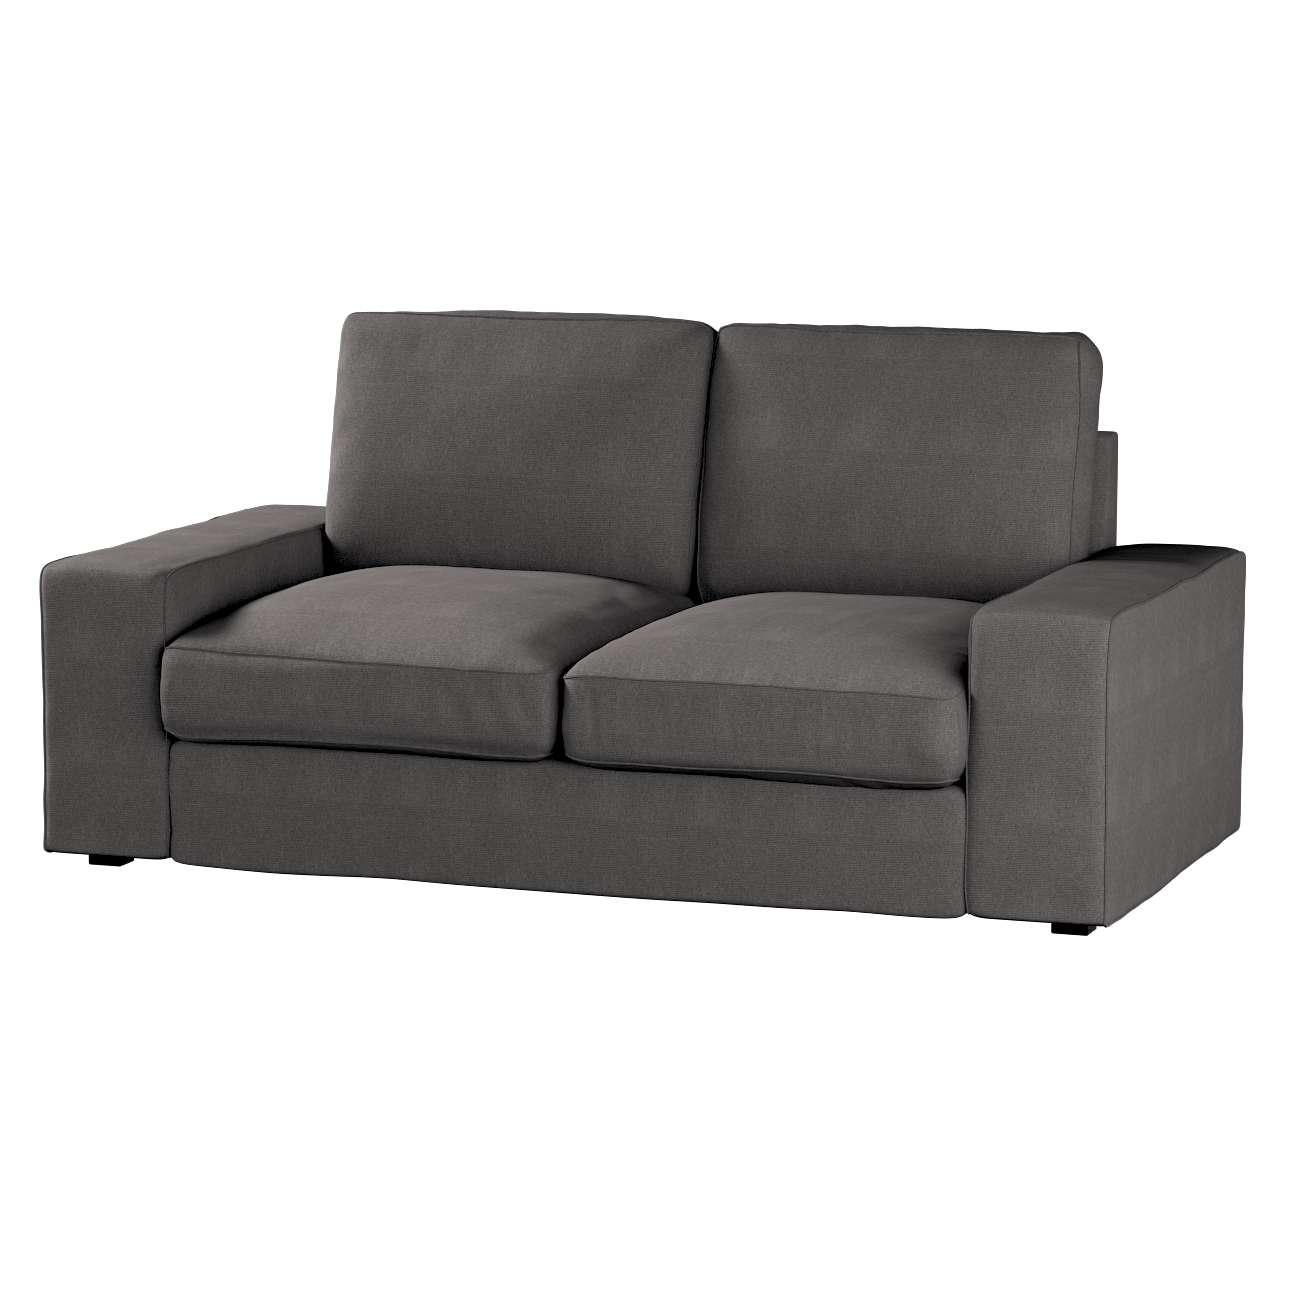 Kivik 2-Sitzer Sofabezug Sofa Kivik 2-Sitzer von der Kollektion Etna, Stoff: 705-35